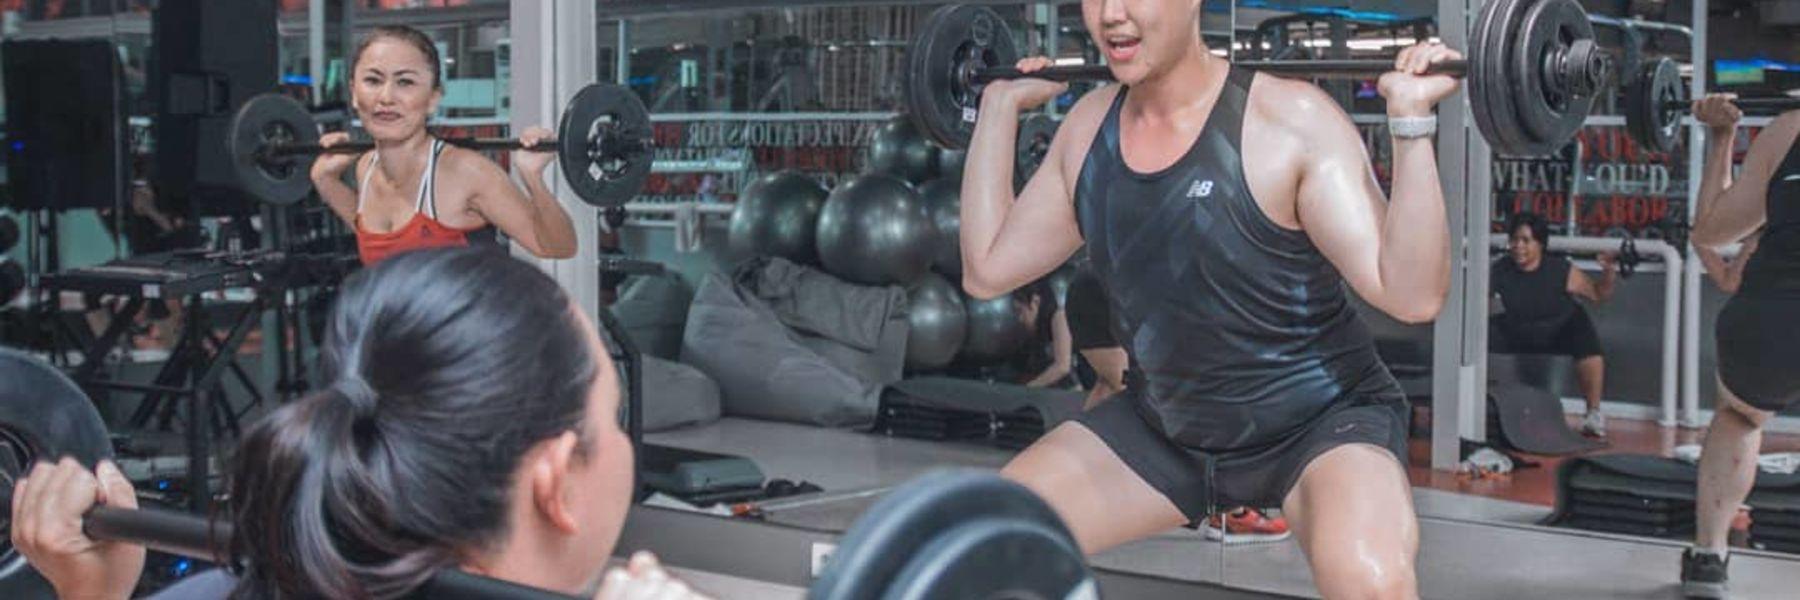 Rai Fitness image